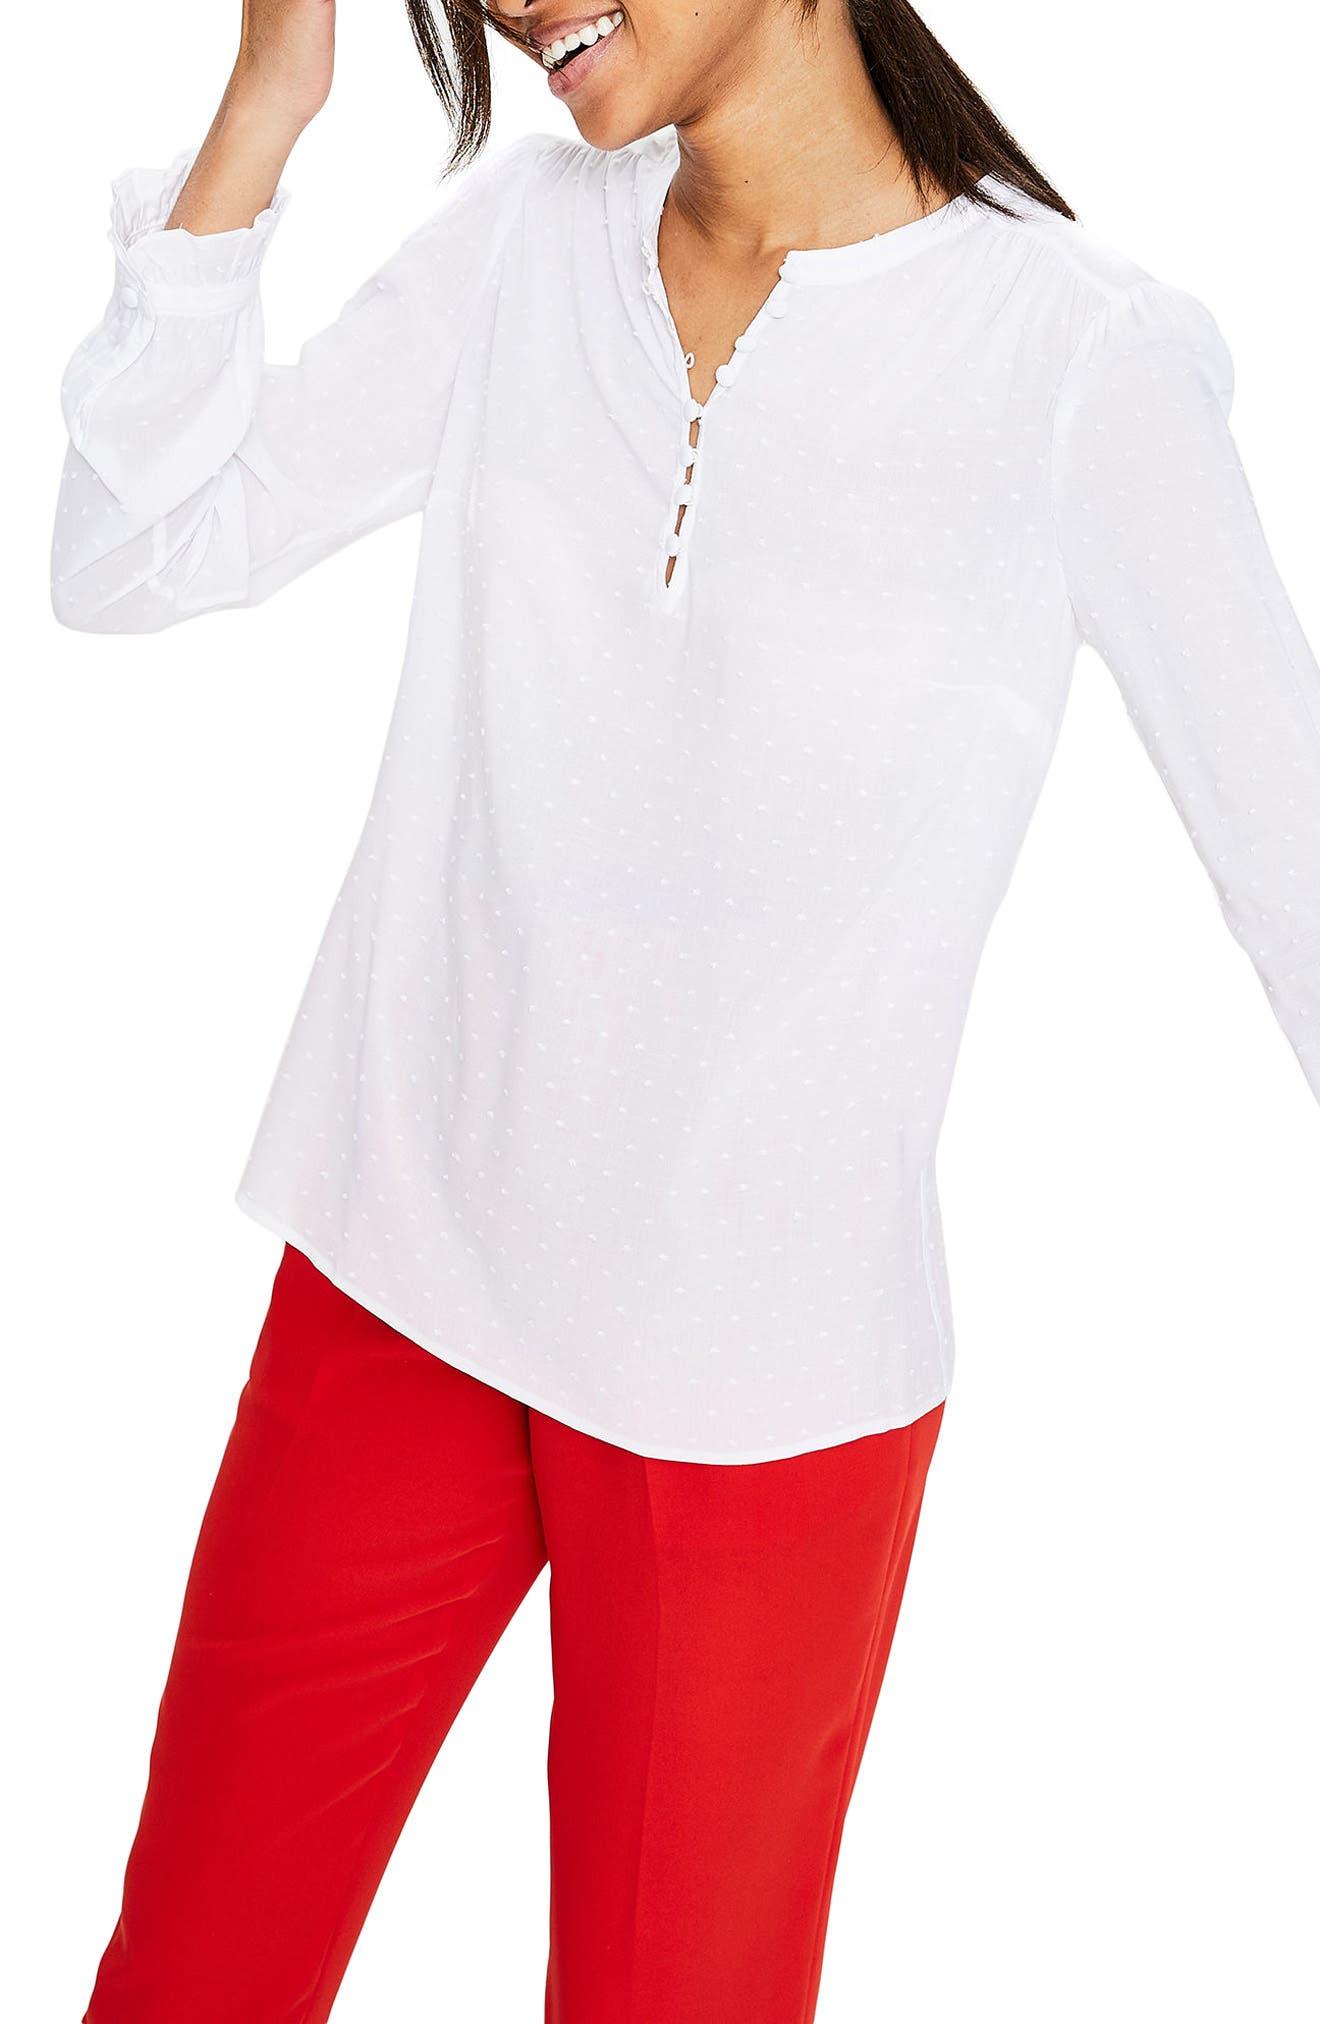 Rouleau Ruffle Top,                         Main,                         color, White